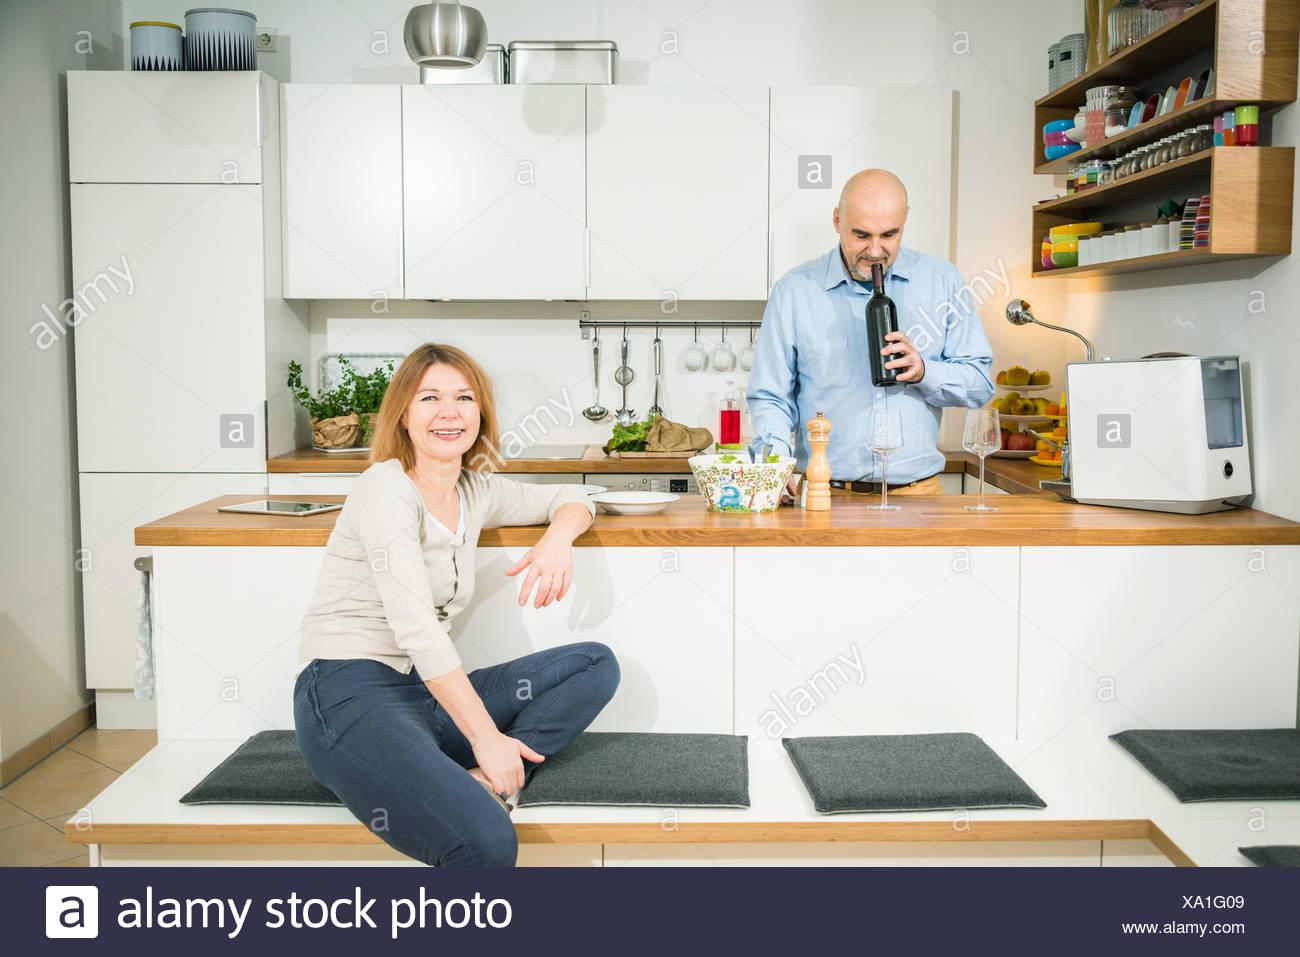 Senior man smelling wine cork in kitchen Stock Photo